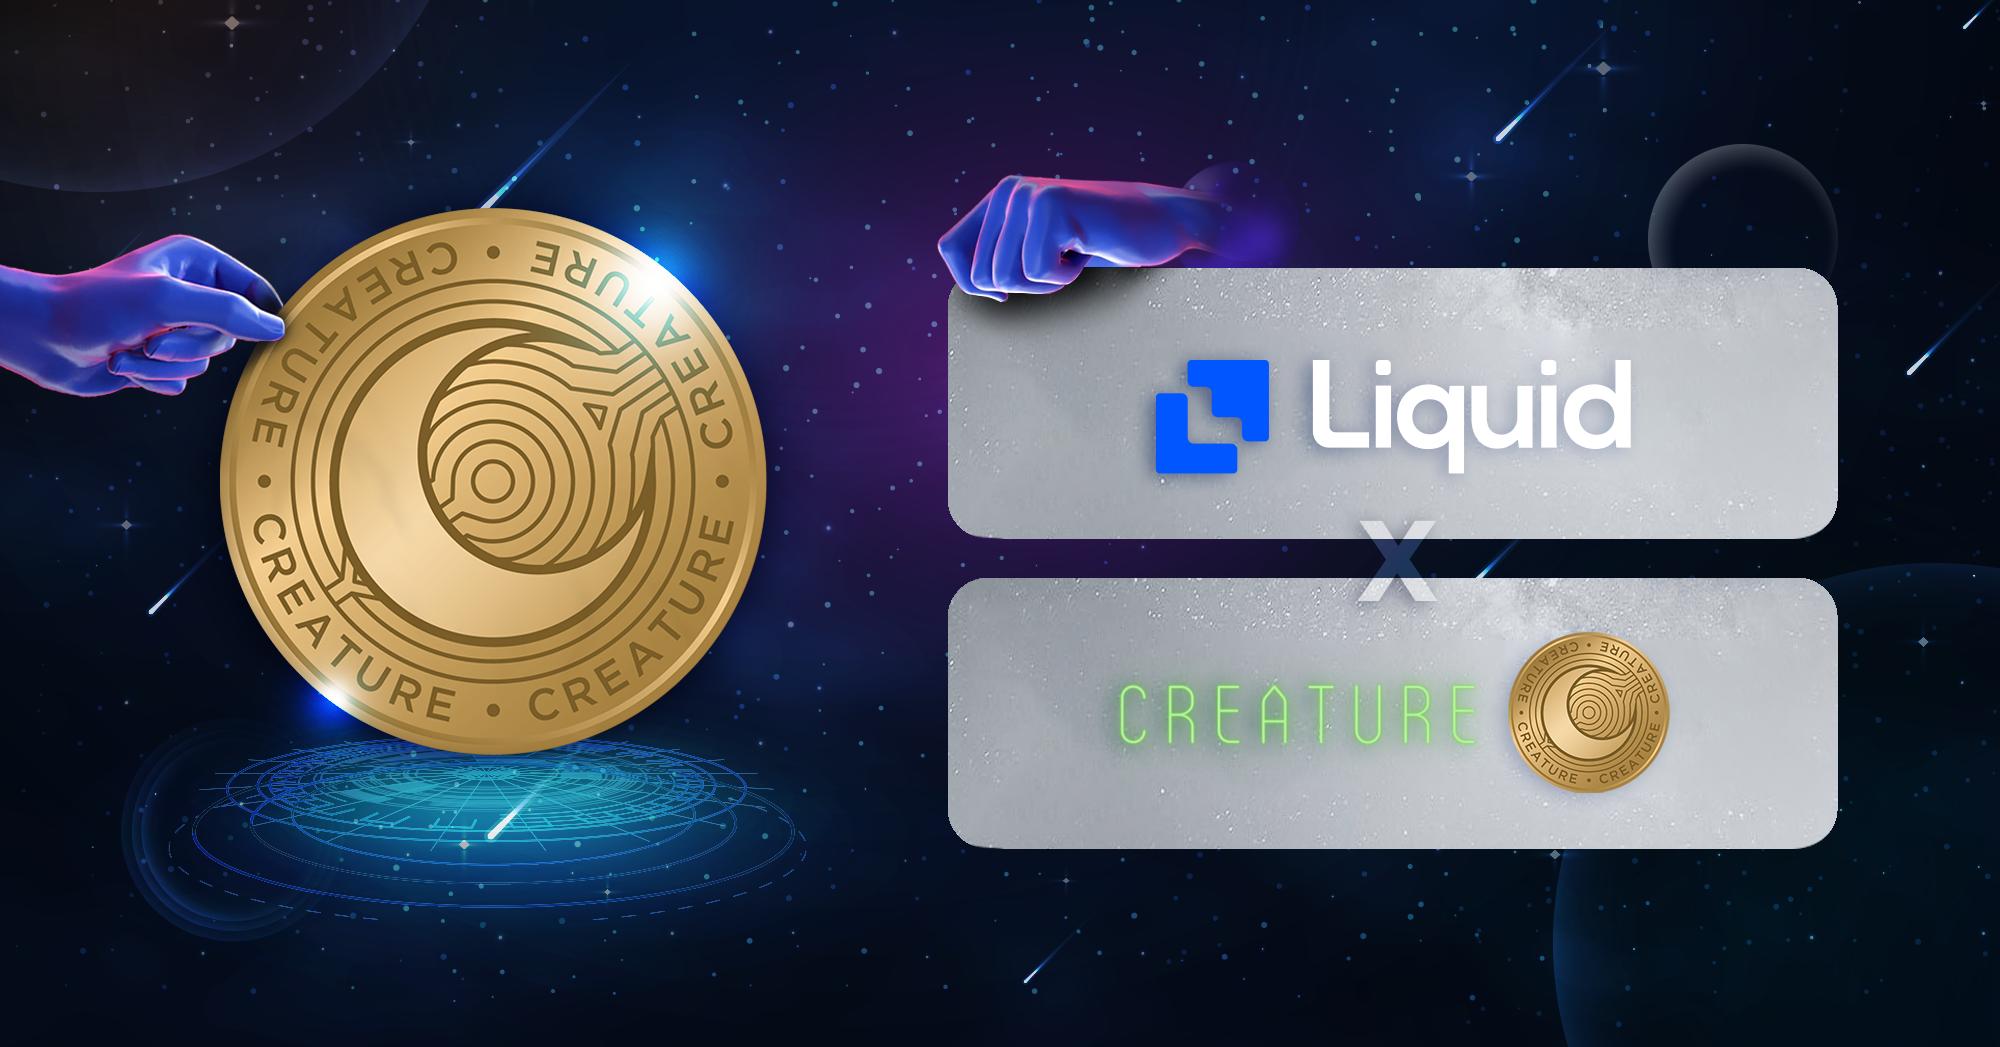 Creature is listing on Liquid exchange, buy CRT